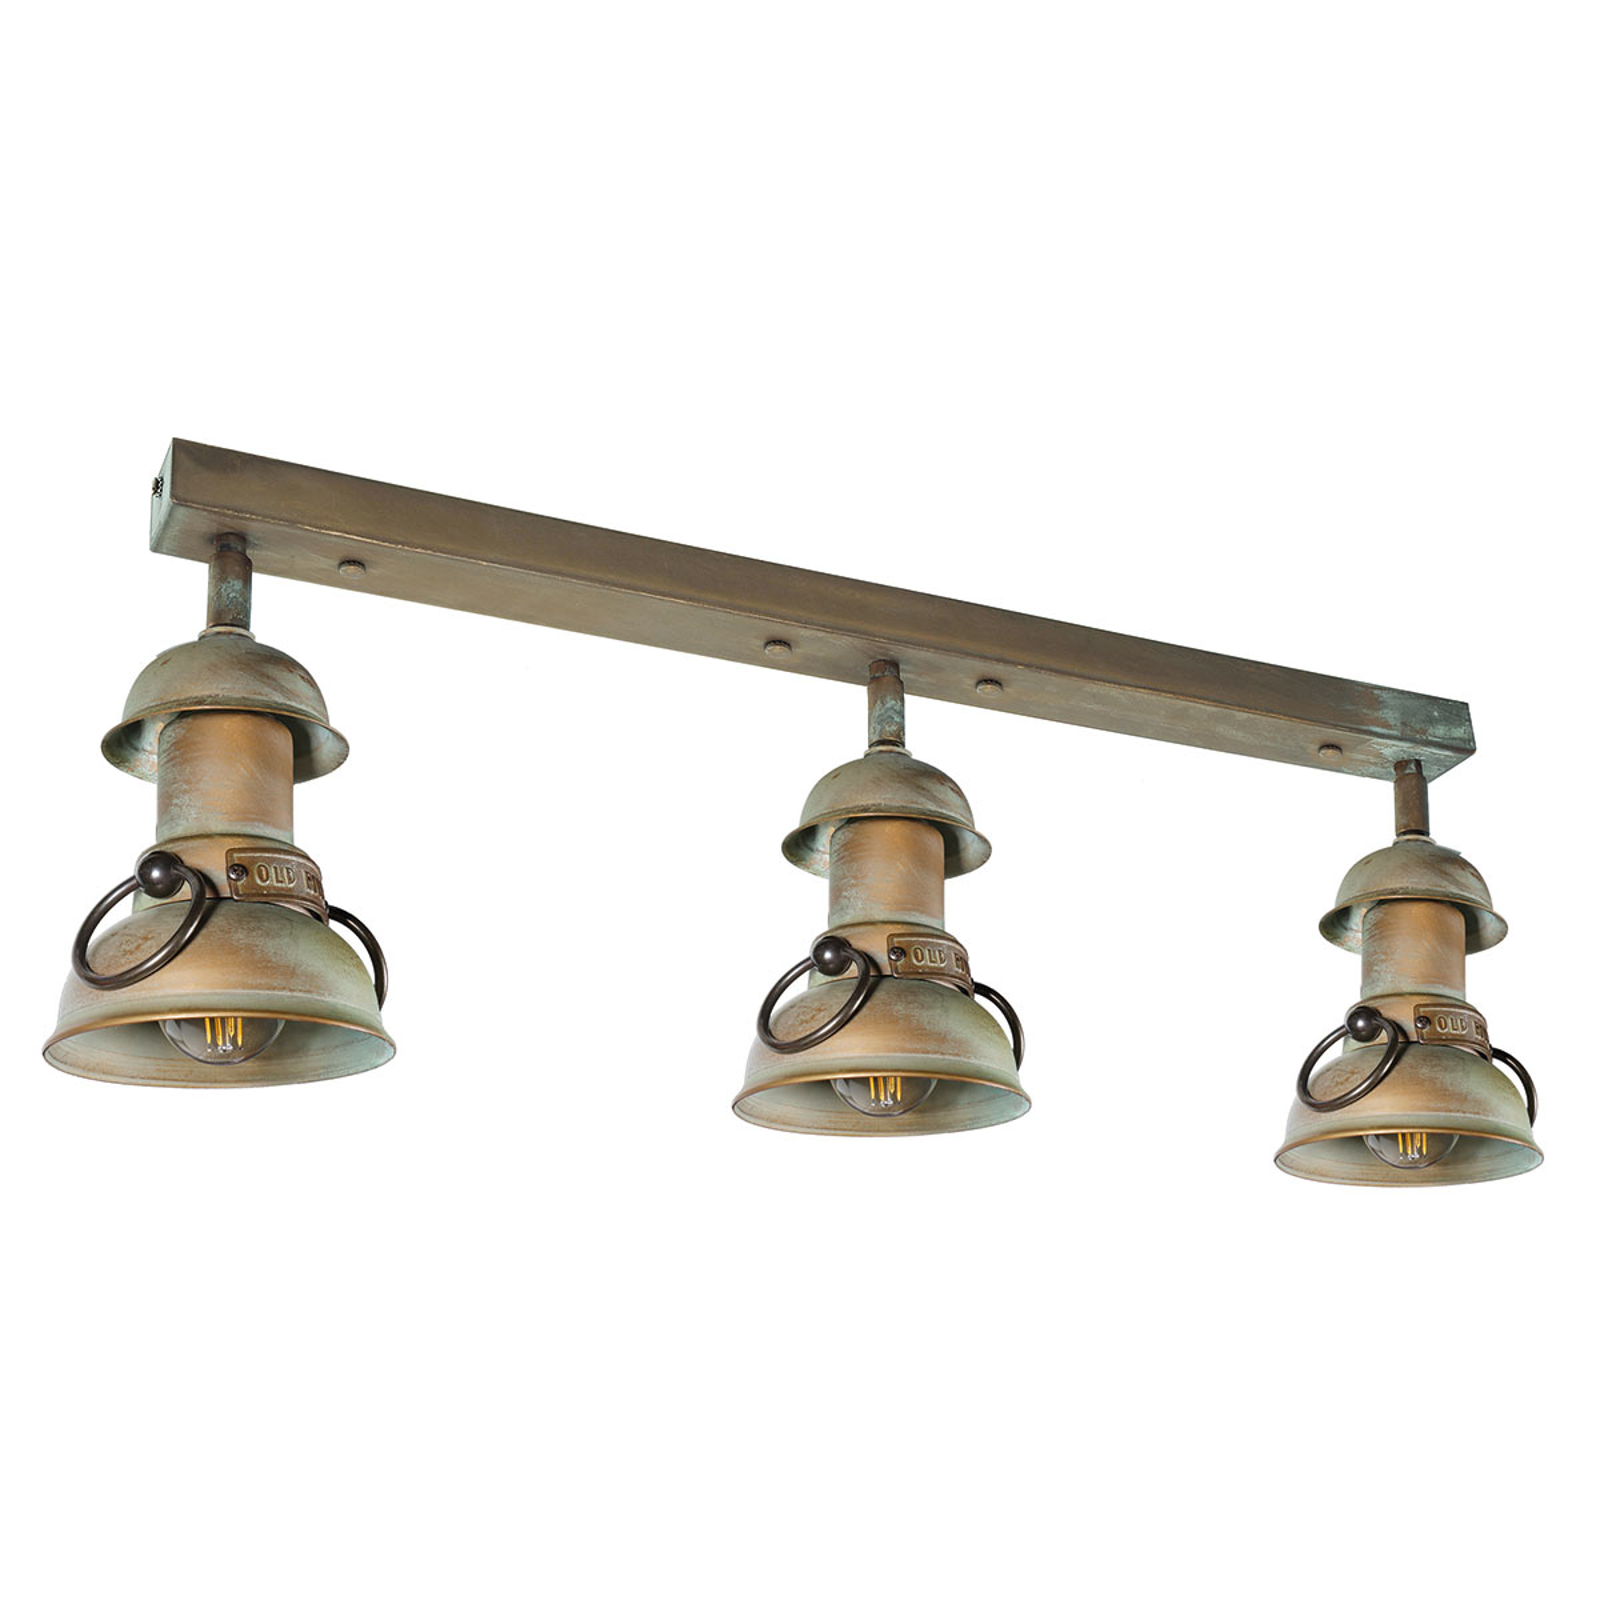 RAVENNA plafondlamp, koper-antiek